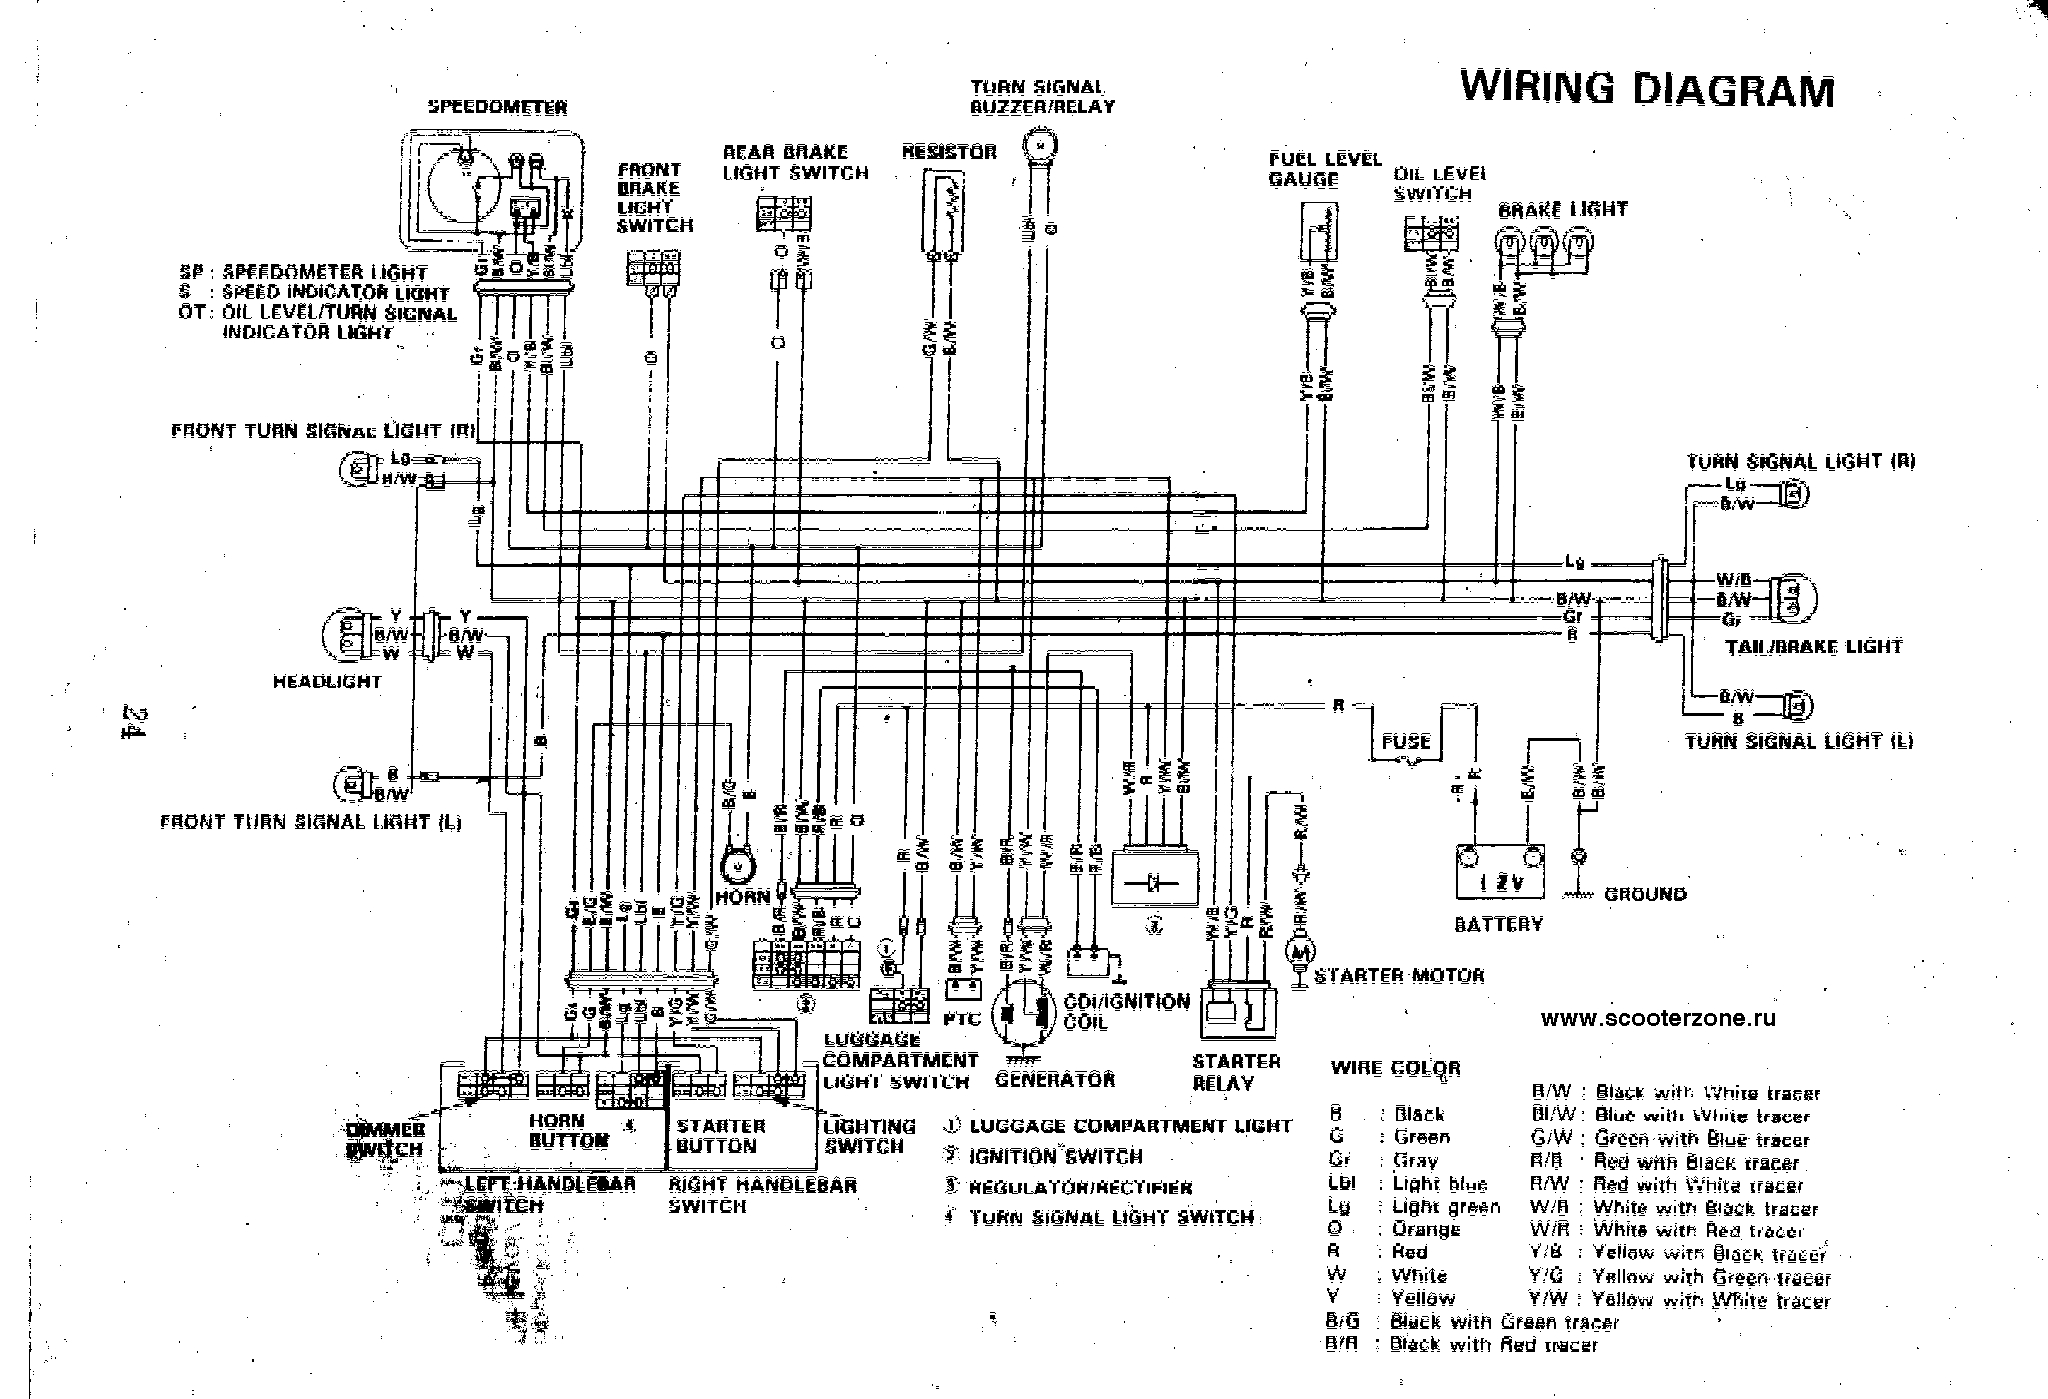 Marvelous Suzuki Na12s Wiring Diagram Gallery - Best Image Diagram ...